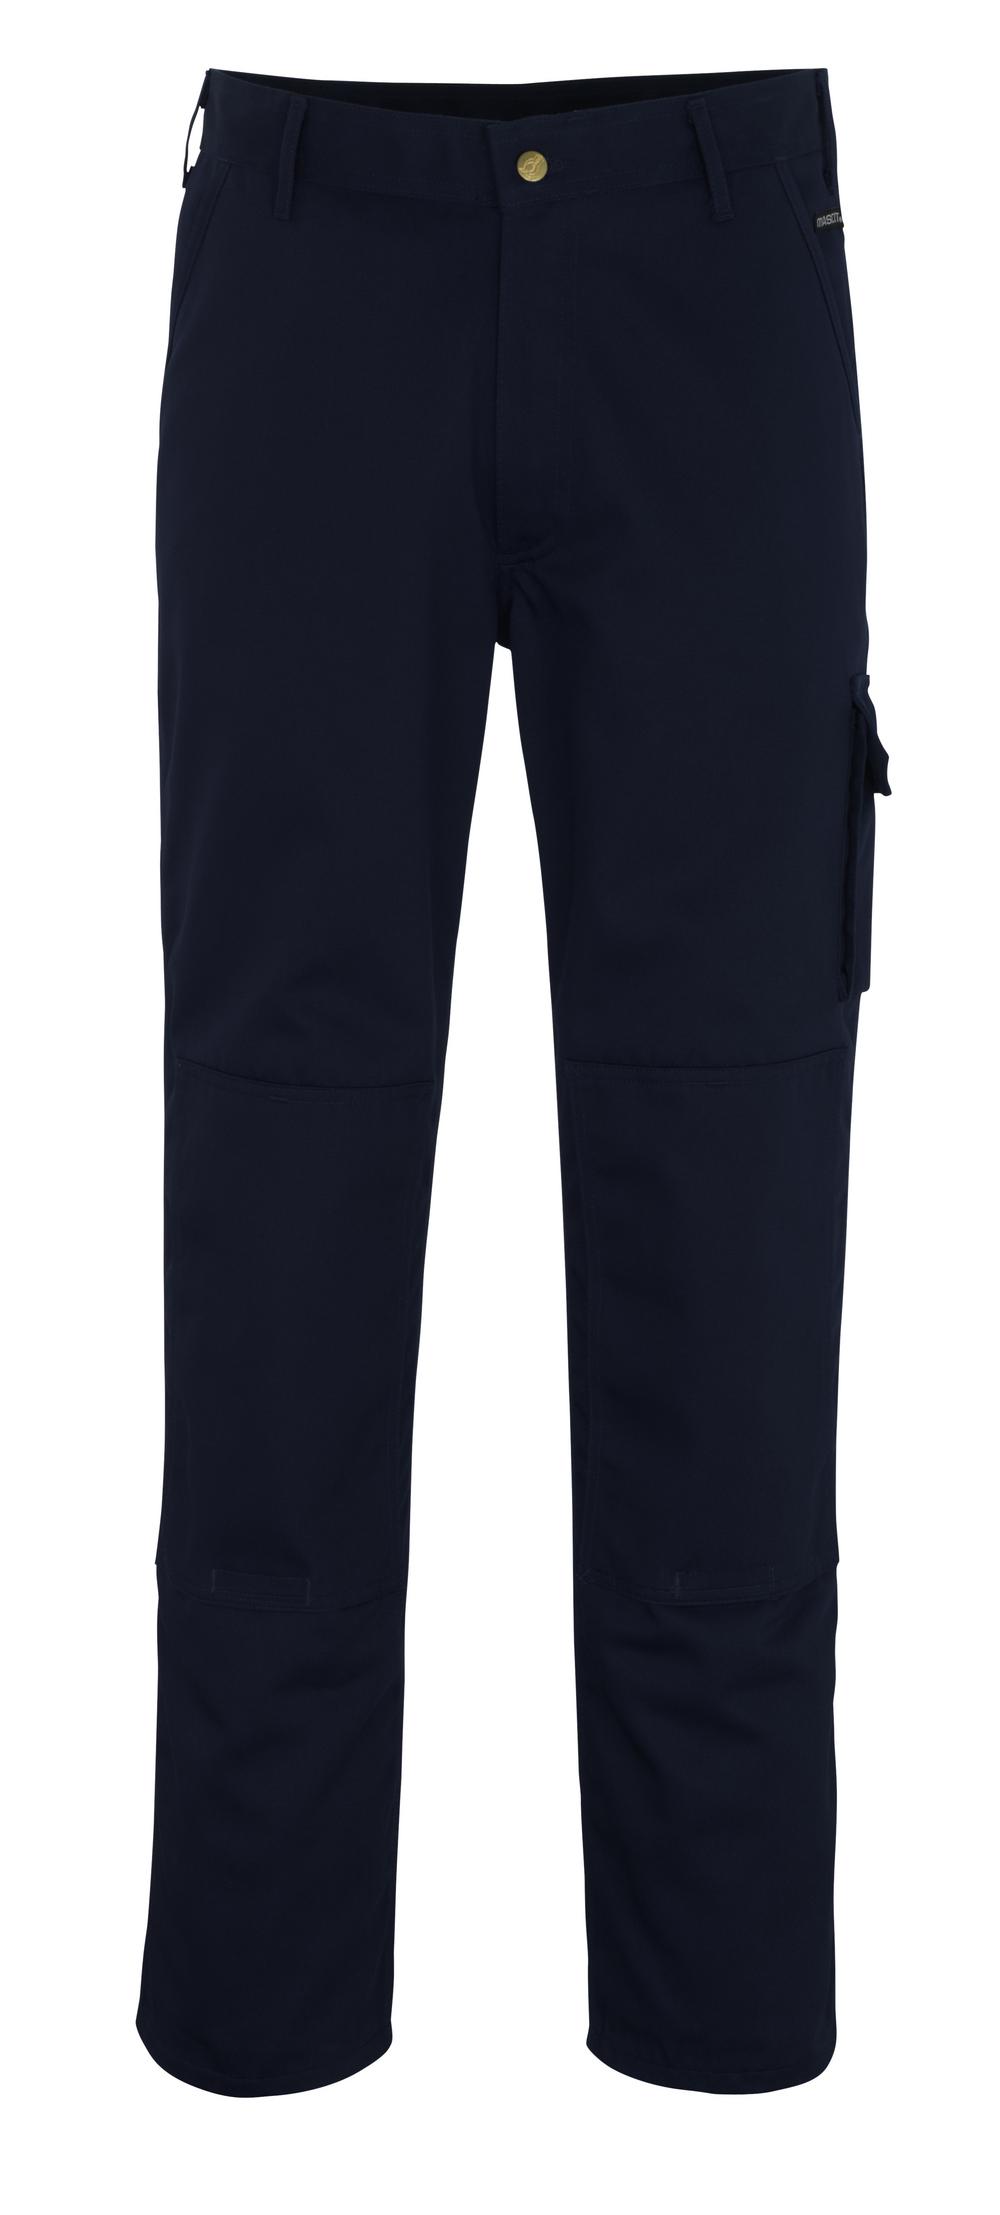 00279-430-01 Pants with kneepad pockets - navy